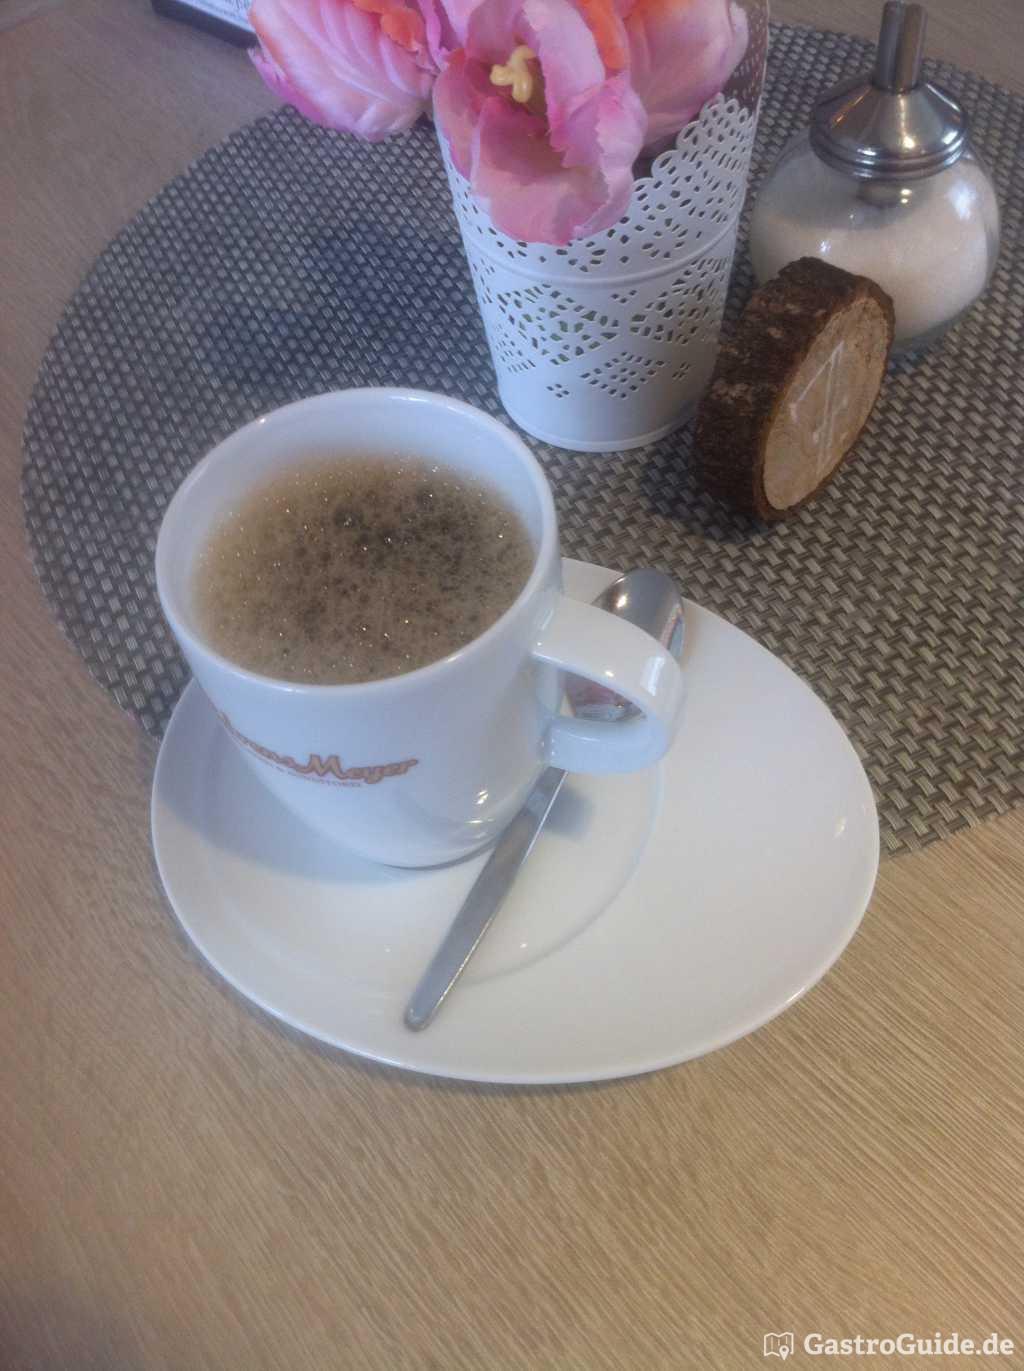 b ckerei behrens meyer le caf b ckerei cafe in 27798 hude oldenburg. Black Bedroom Furniture Sets. Home Design Ideas